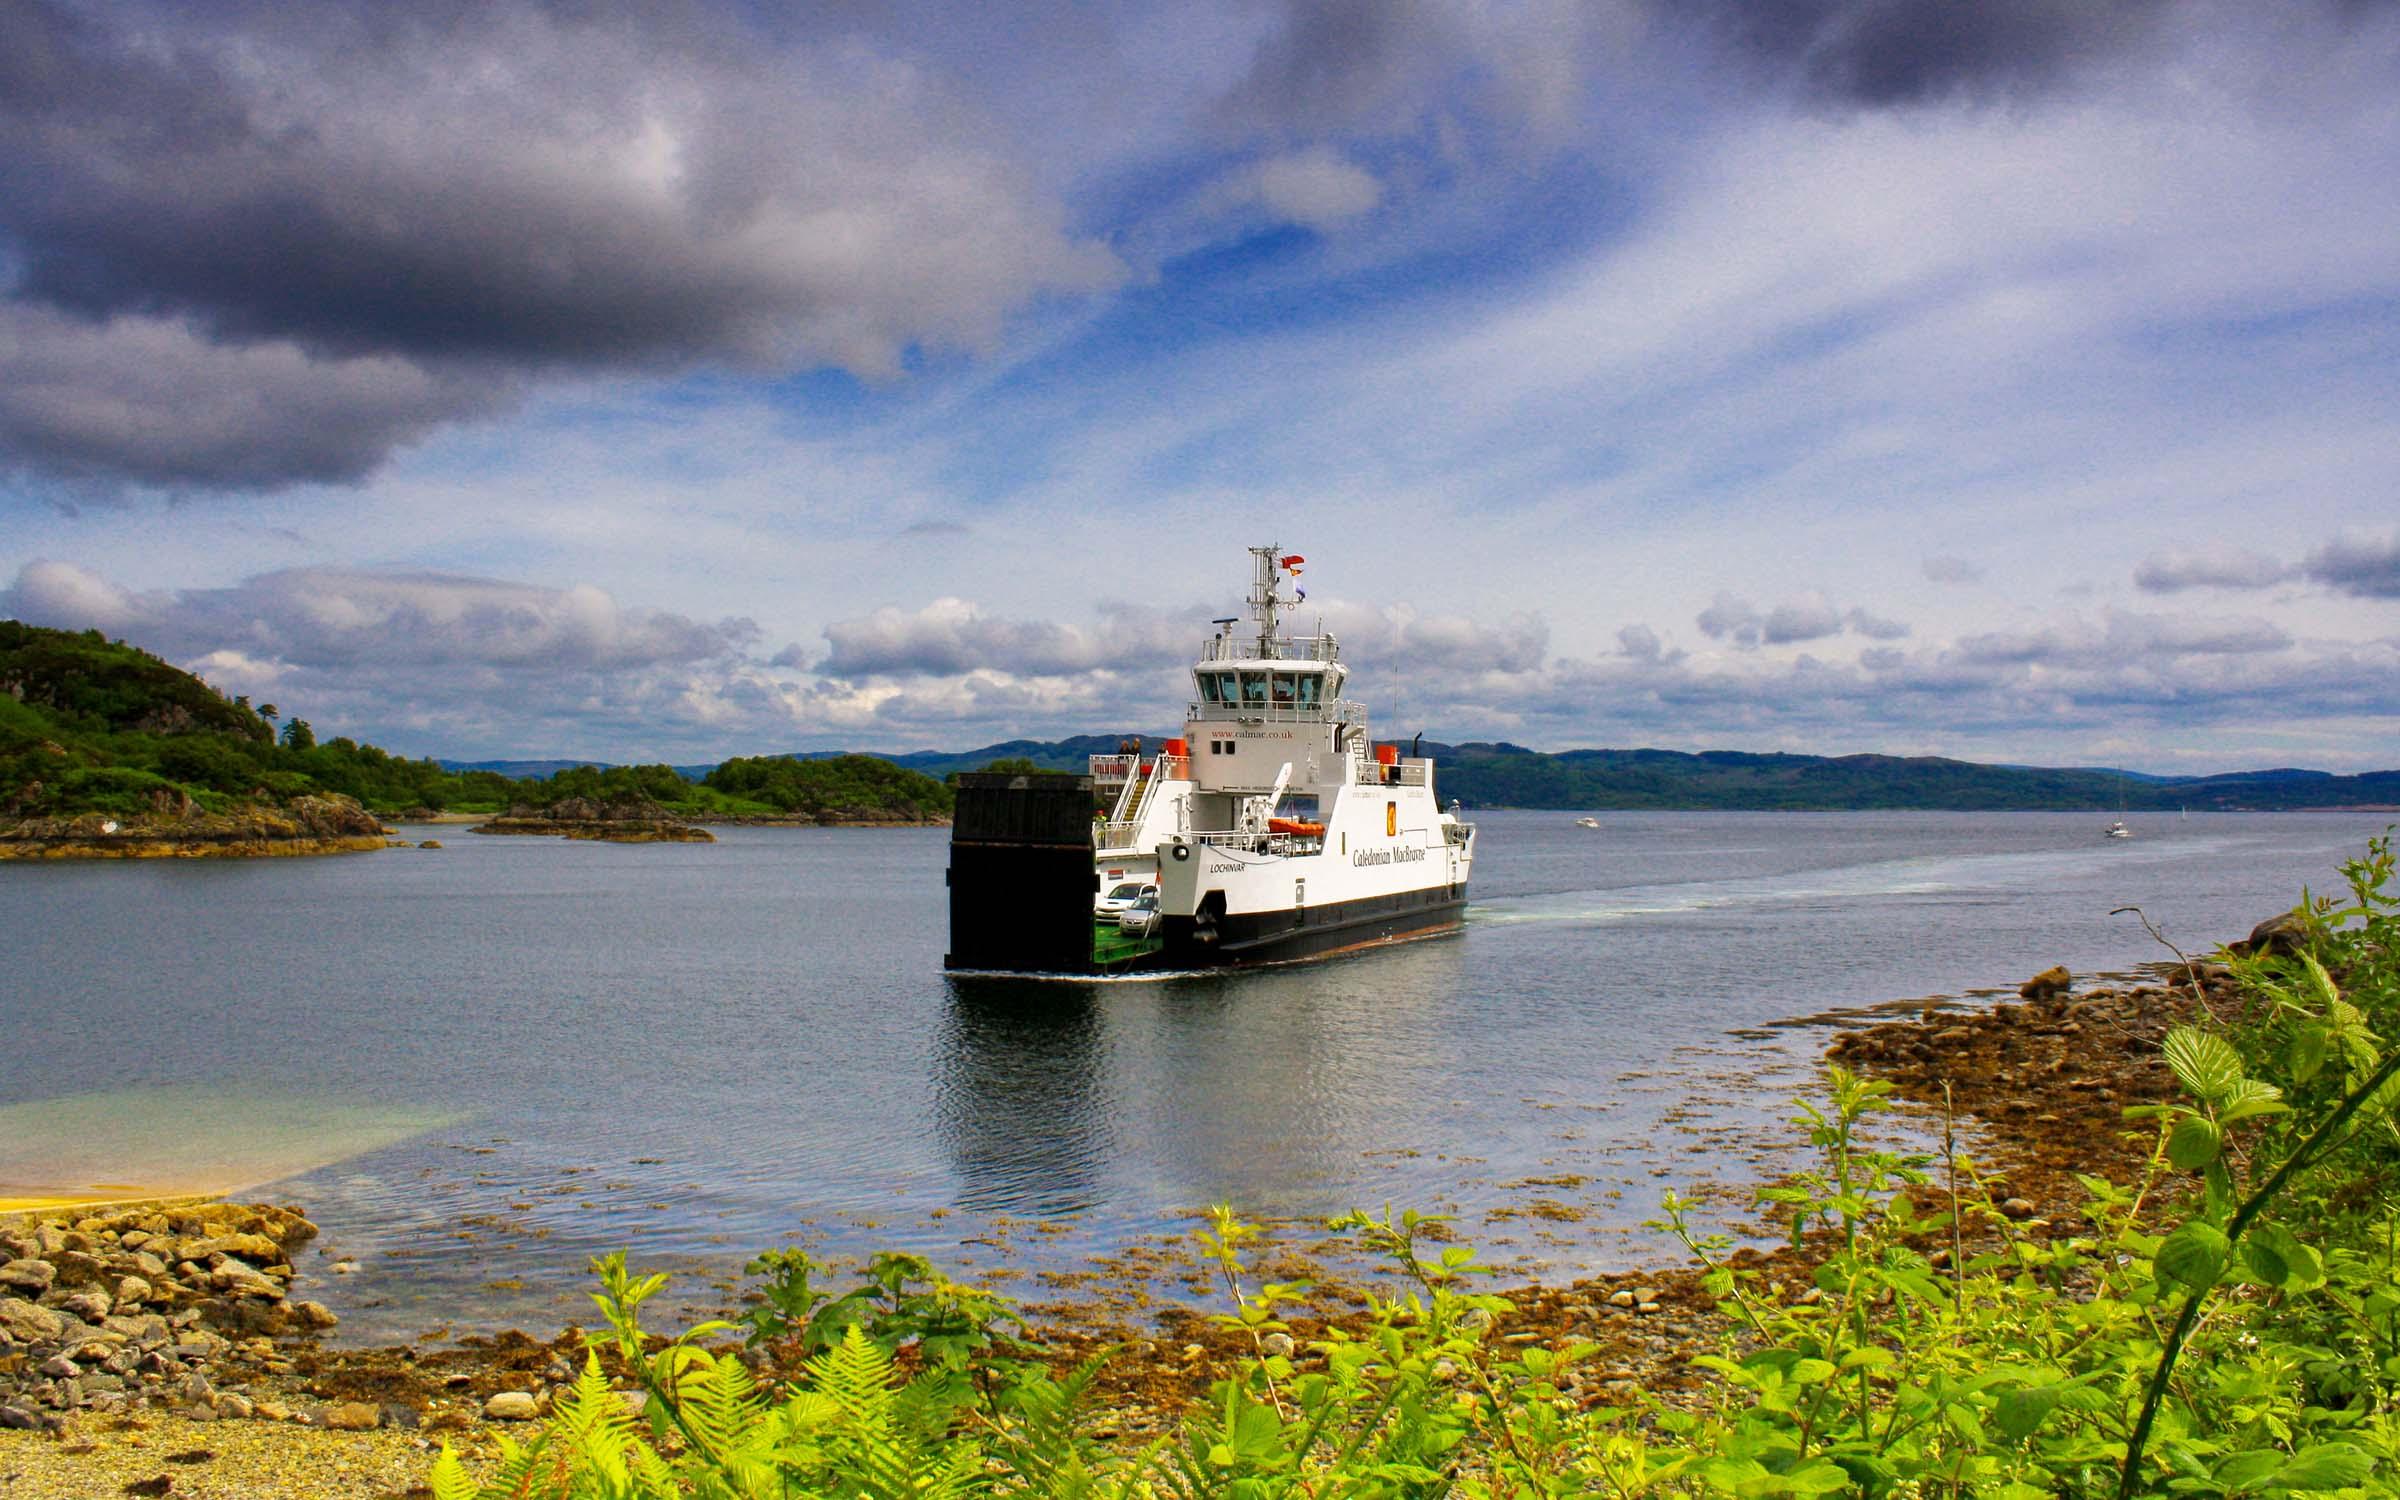 Lochinvar arriving at Tarbert (Ships of CalMac)